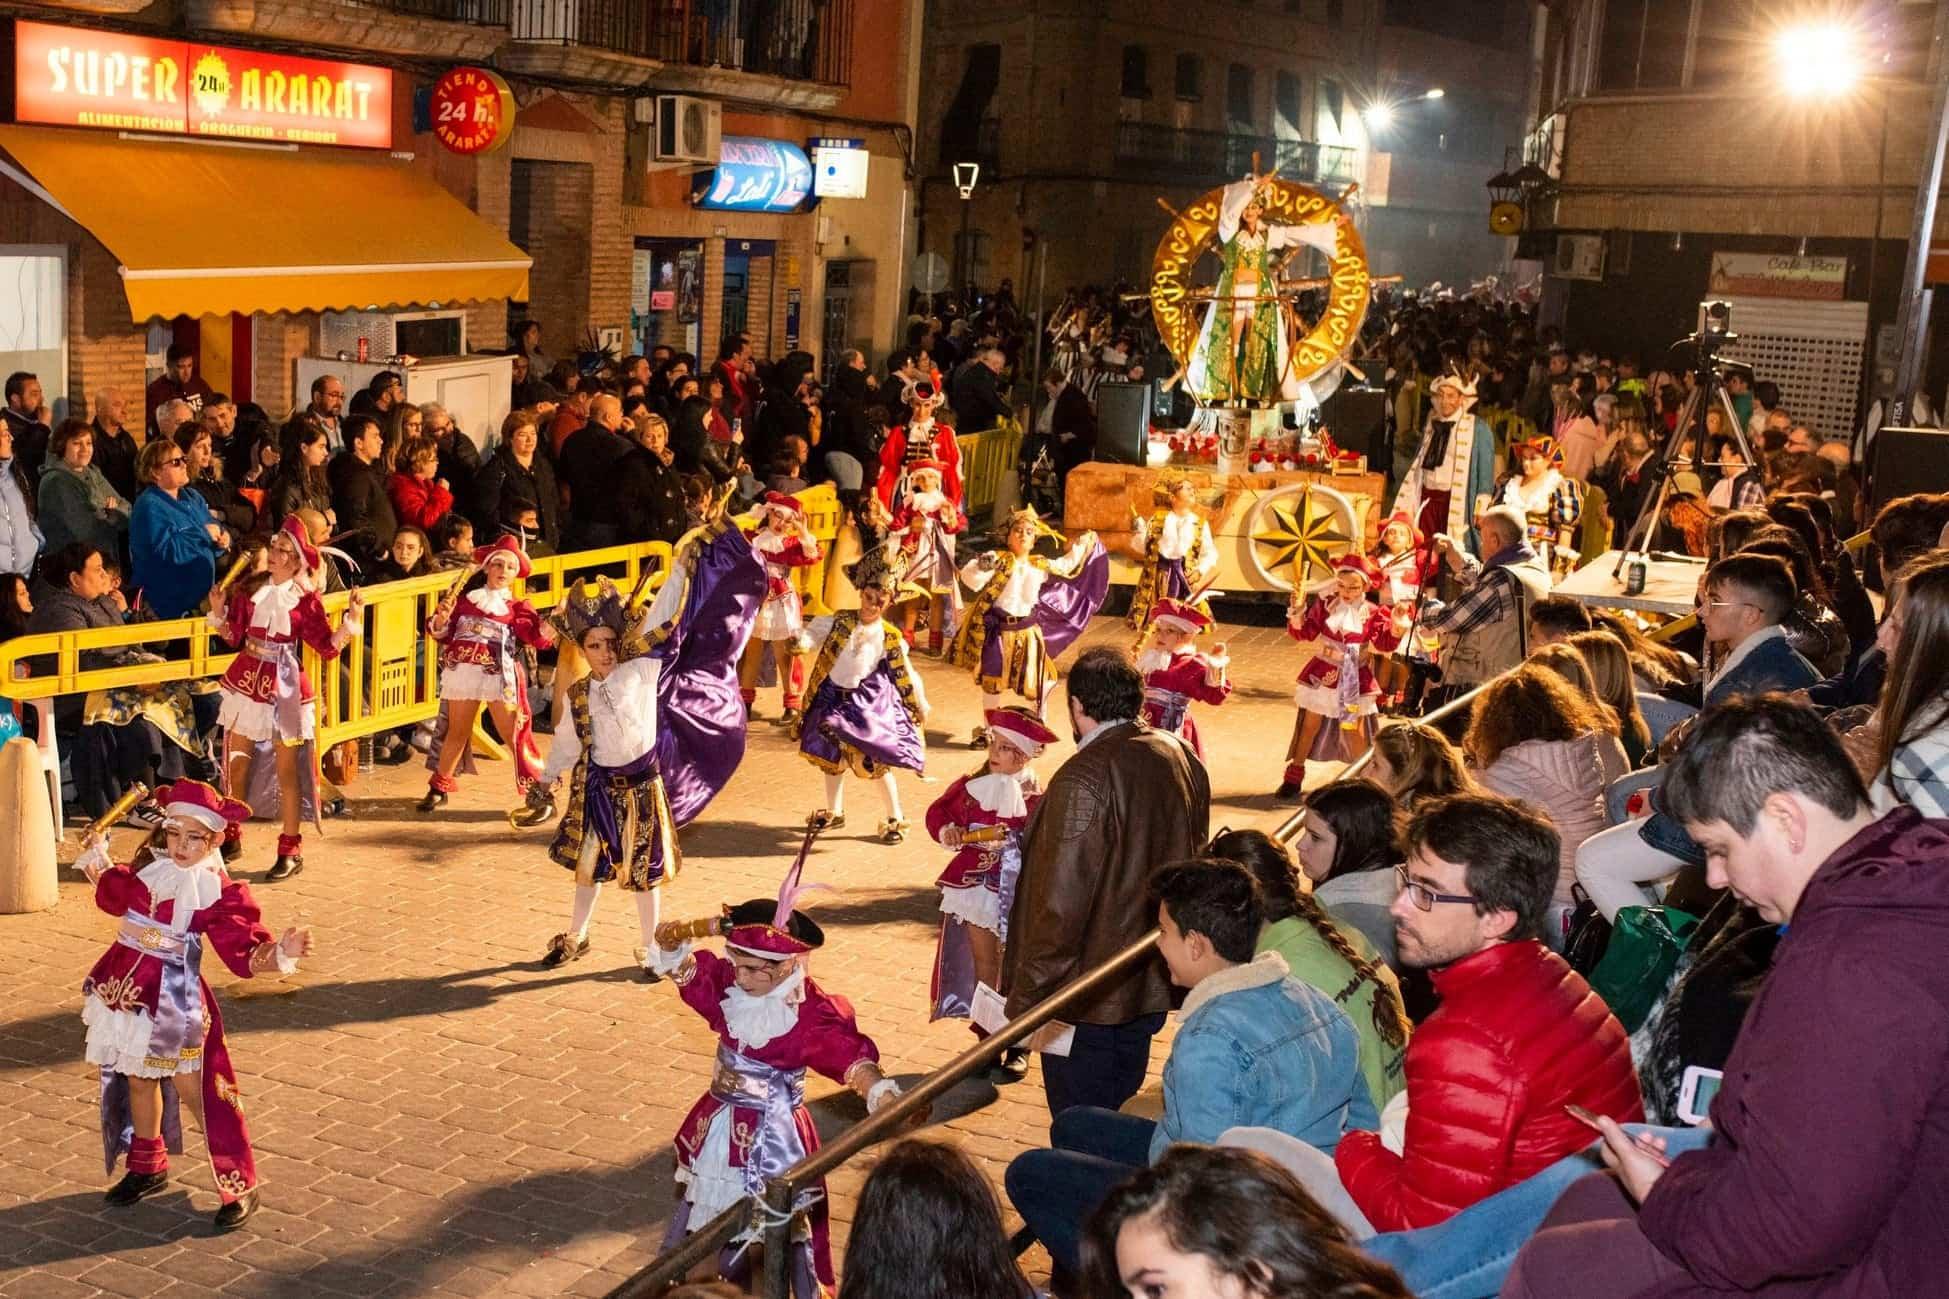 Carnaval de herencia 2020 ofertorio 162 - Selección de fotografías del Ofertorio del Carnaval de Herencia